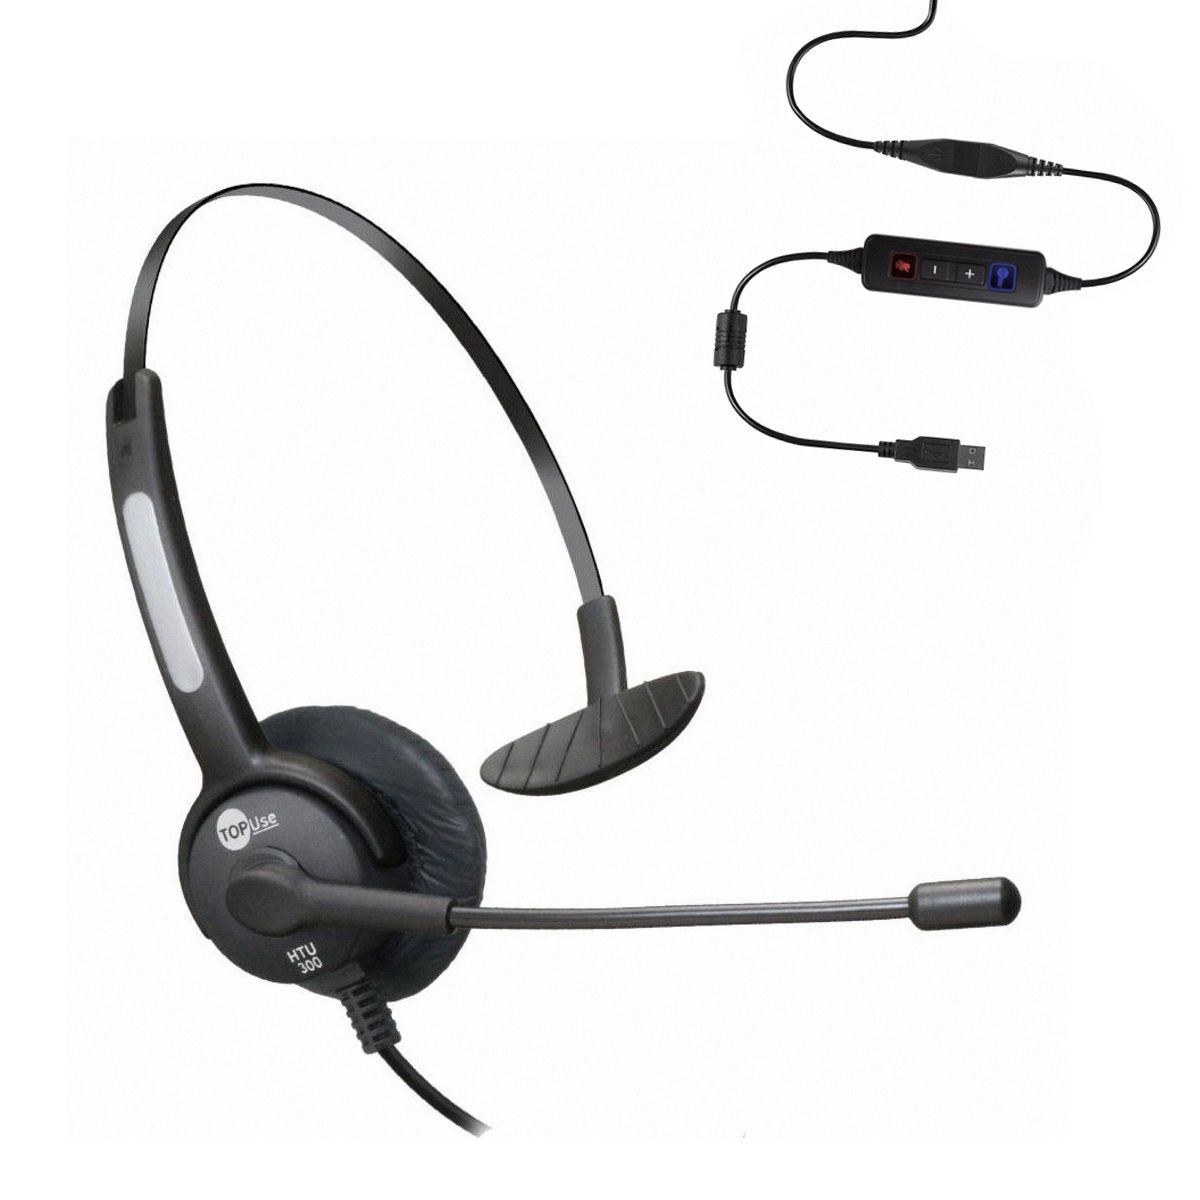 Headset USB Voip Skype MonoAuricular Com Cancelador De Ruído Htu-300 TopUse